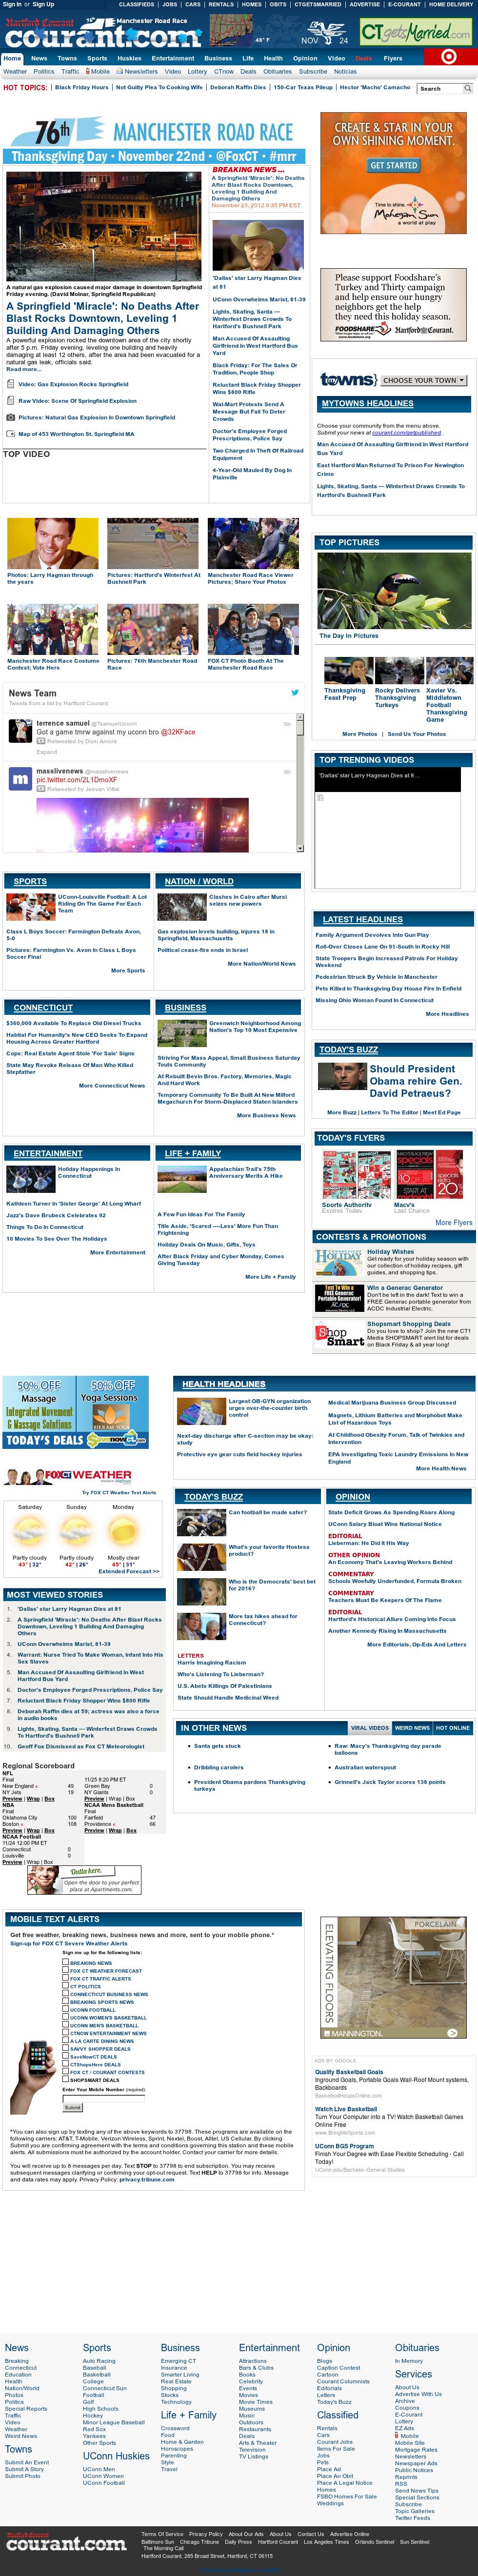 Hartford Courant at Saturday Nov. 24, 2012, 9:14 a.m. UTC